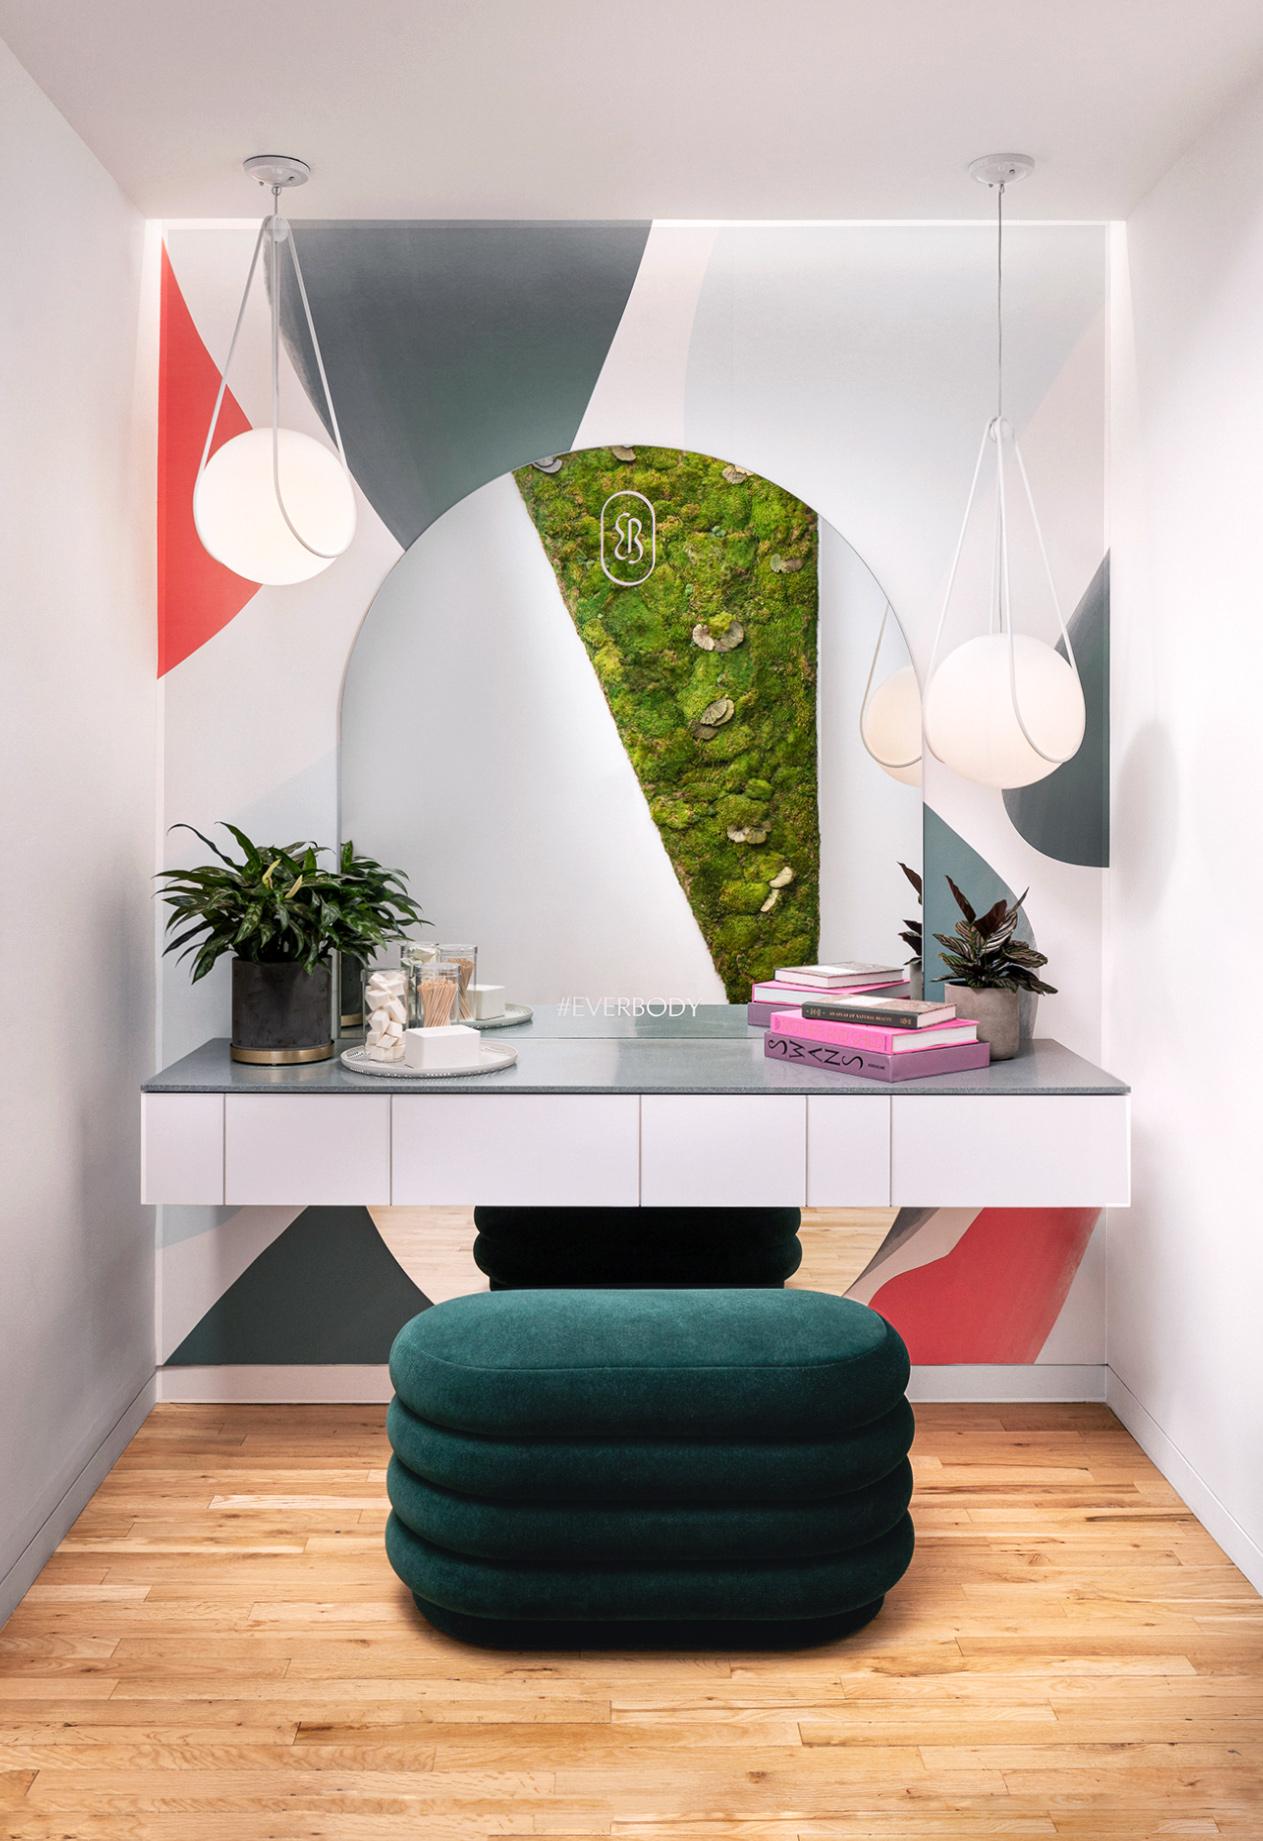 interiors_3_sm.jpg